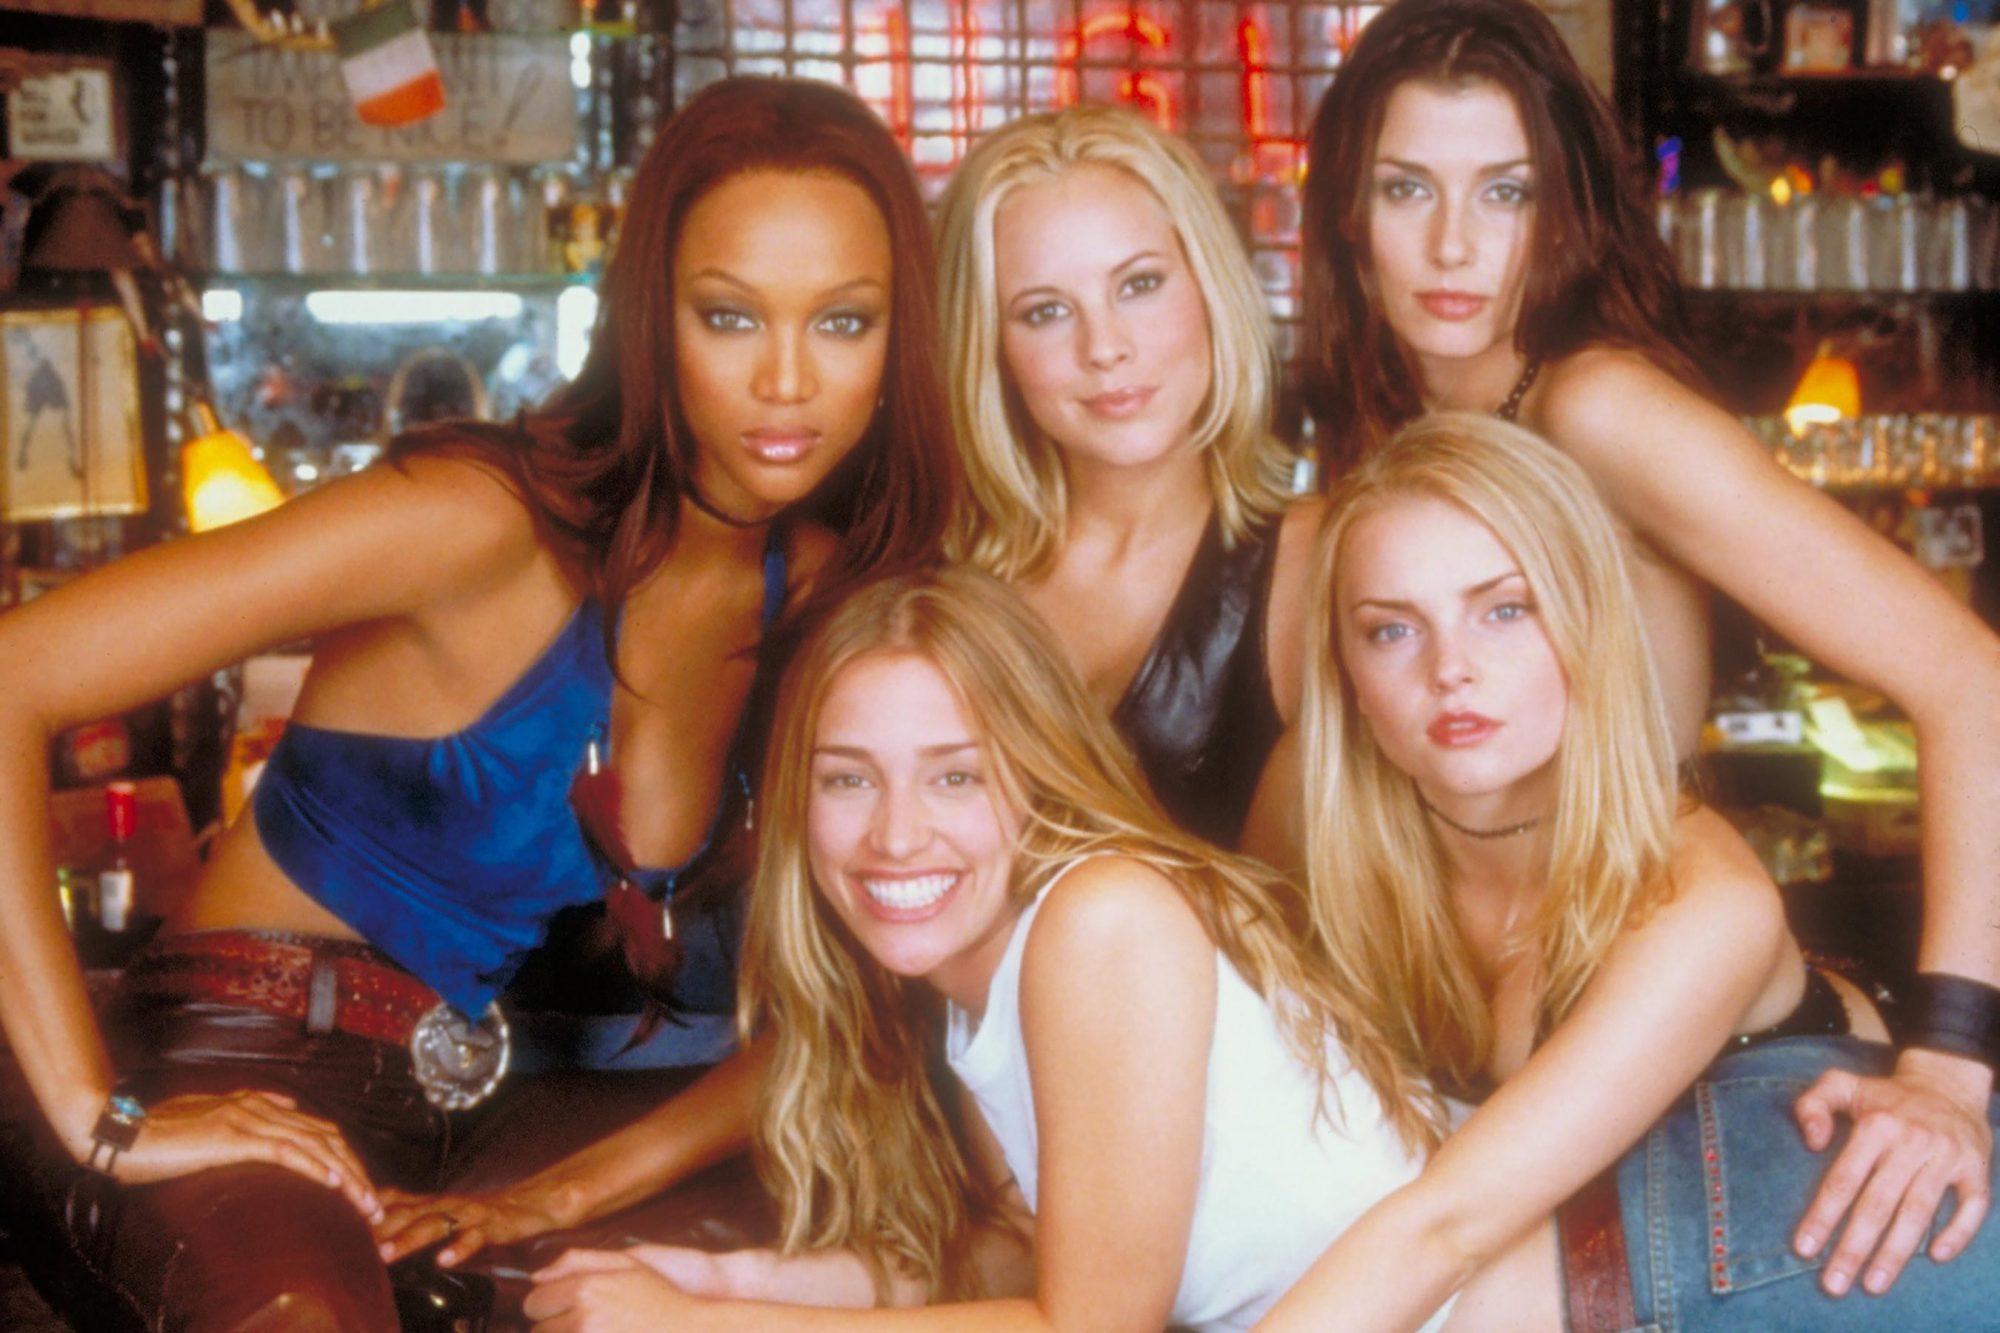 COYOTE UGLY, Tyra Banks, Piper Perabo, Maria Bello, Bridget Moynahan, Izabella Miko, 2000. (c) Buena